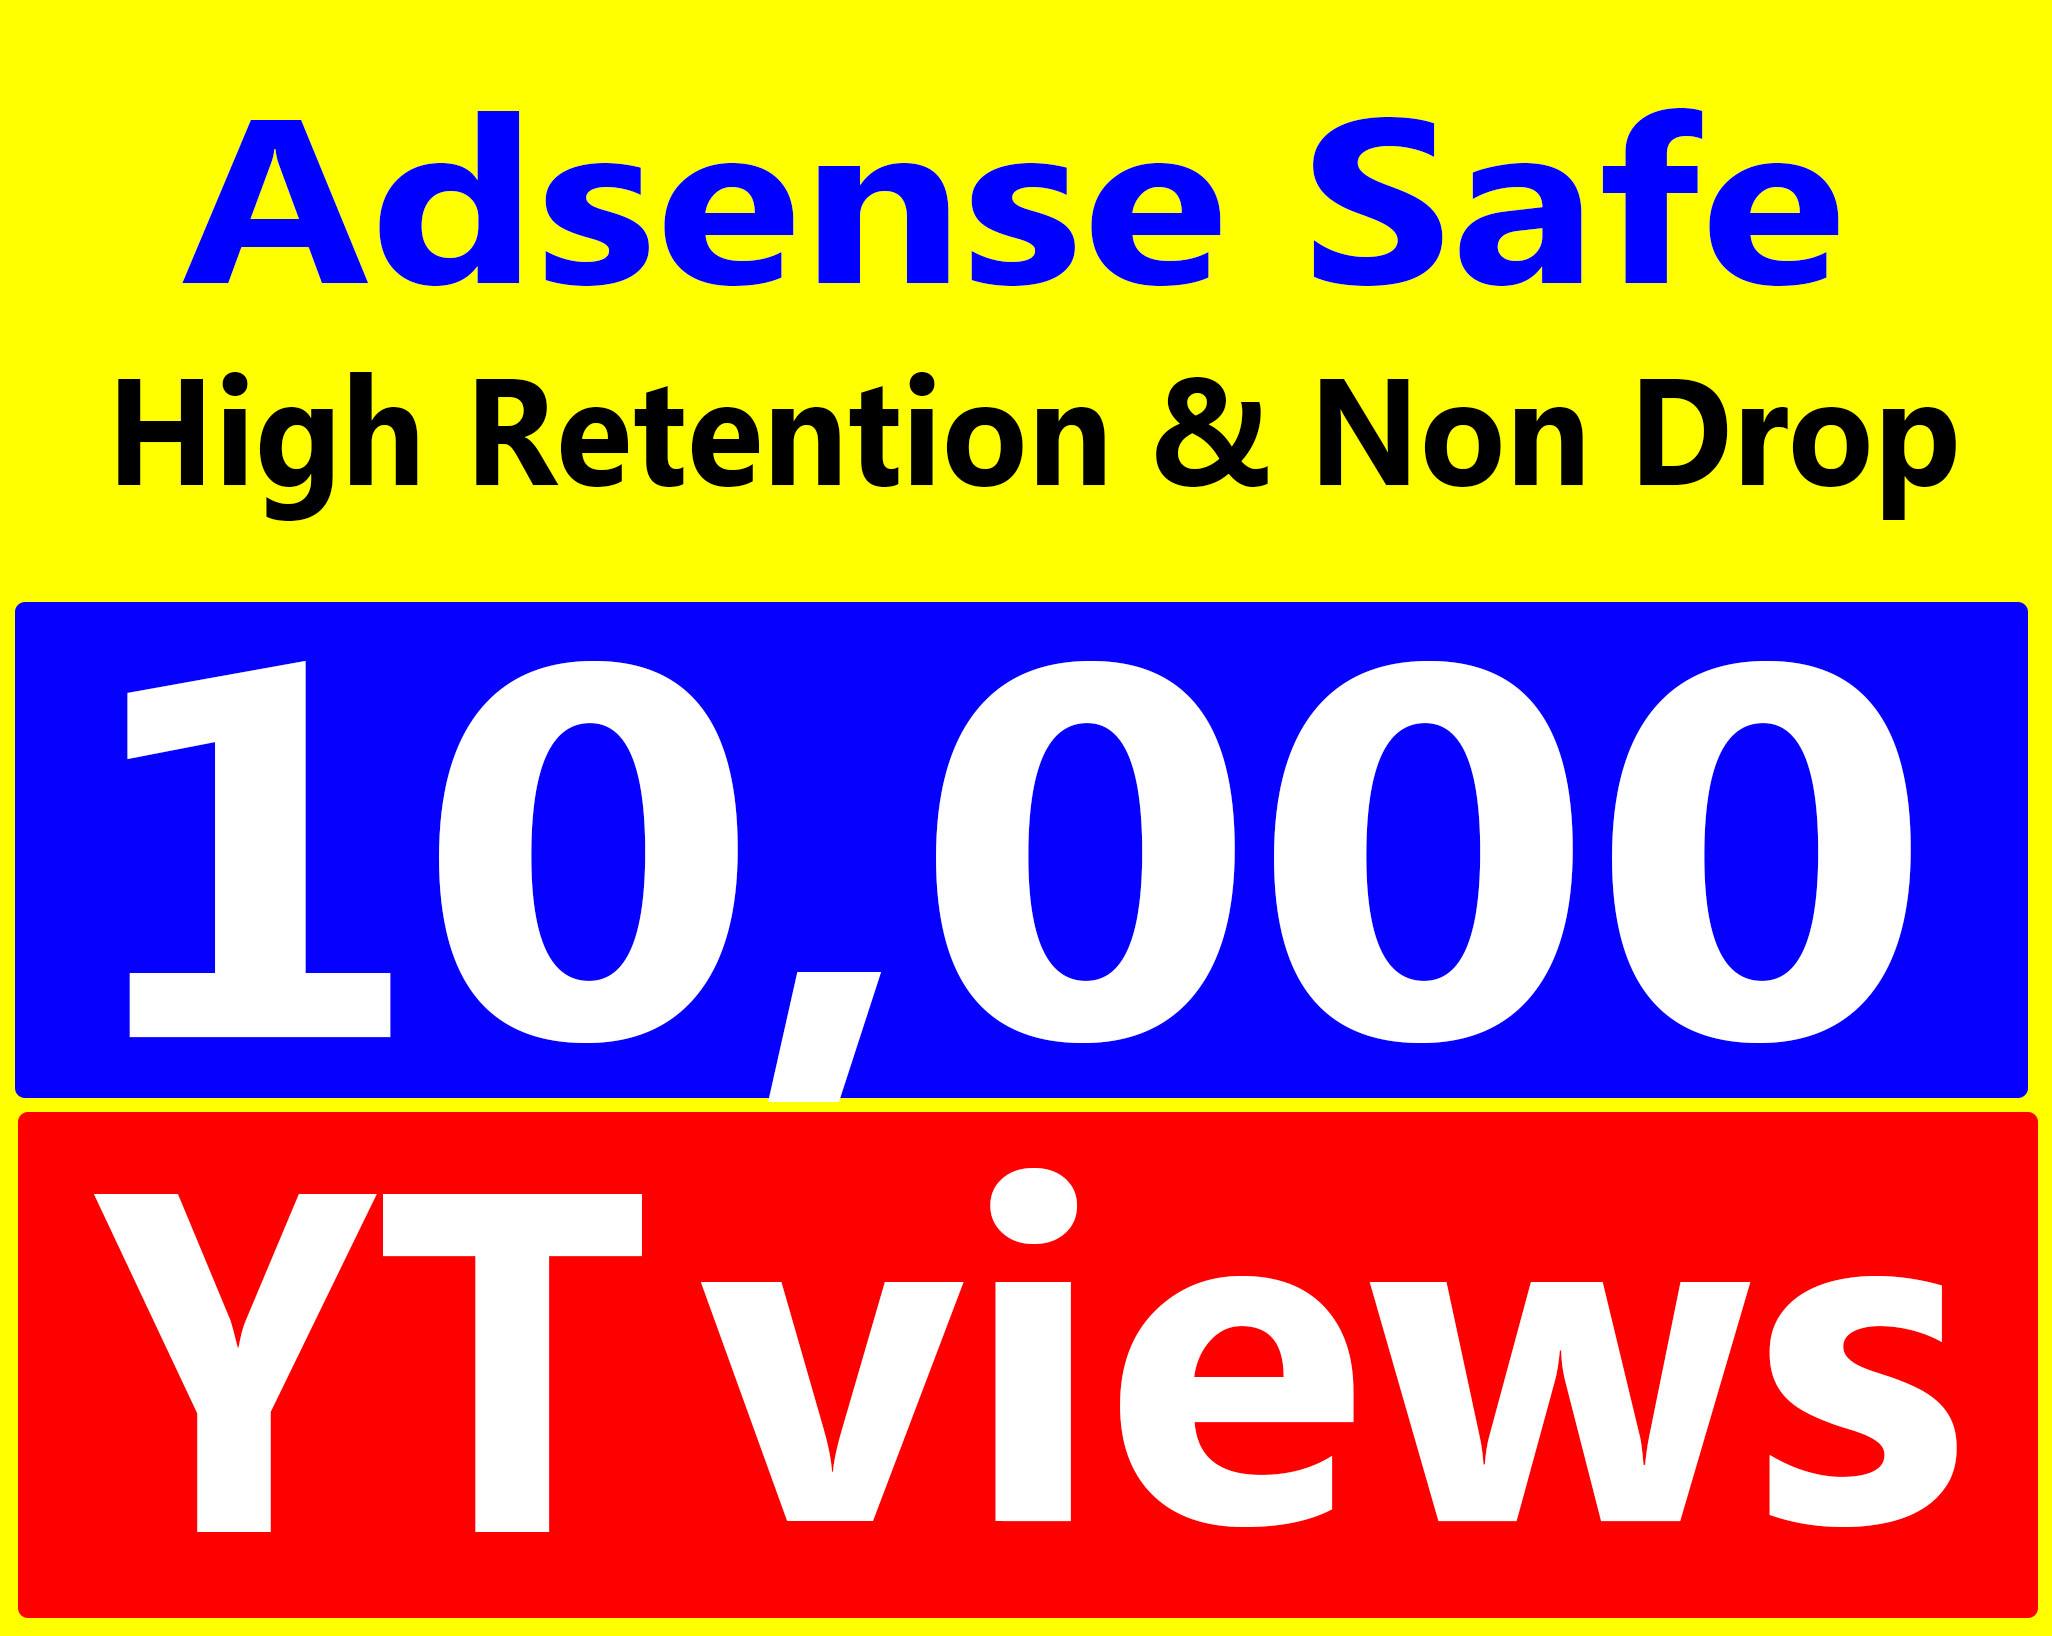 Fast 50,000+ Vi-ews High Retentions 90-99% Ad-sense Safe, Non Drop Express Service